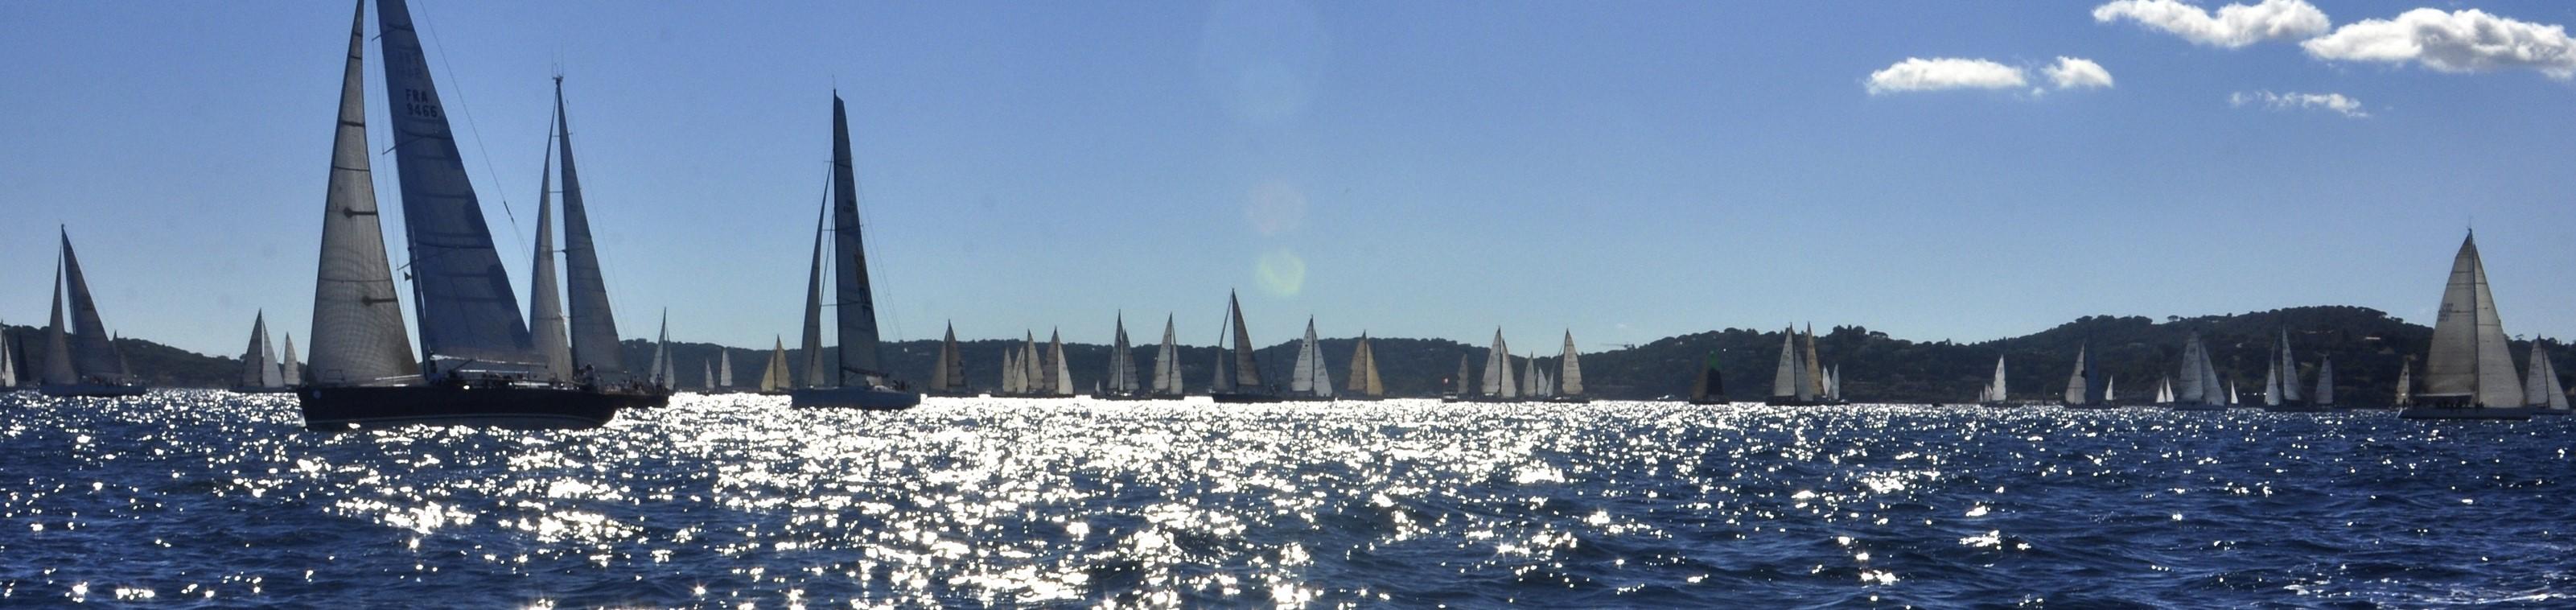 Exclusief zeilevenement Les Voiles de Saint Tropez